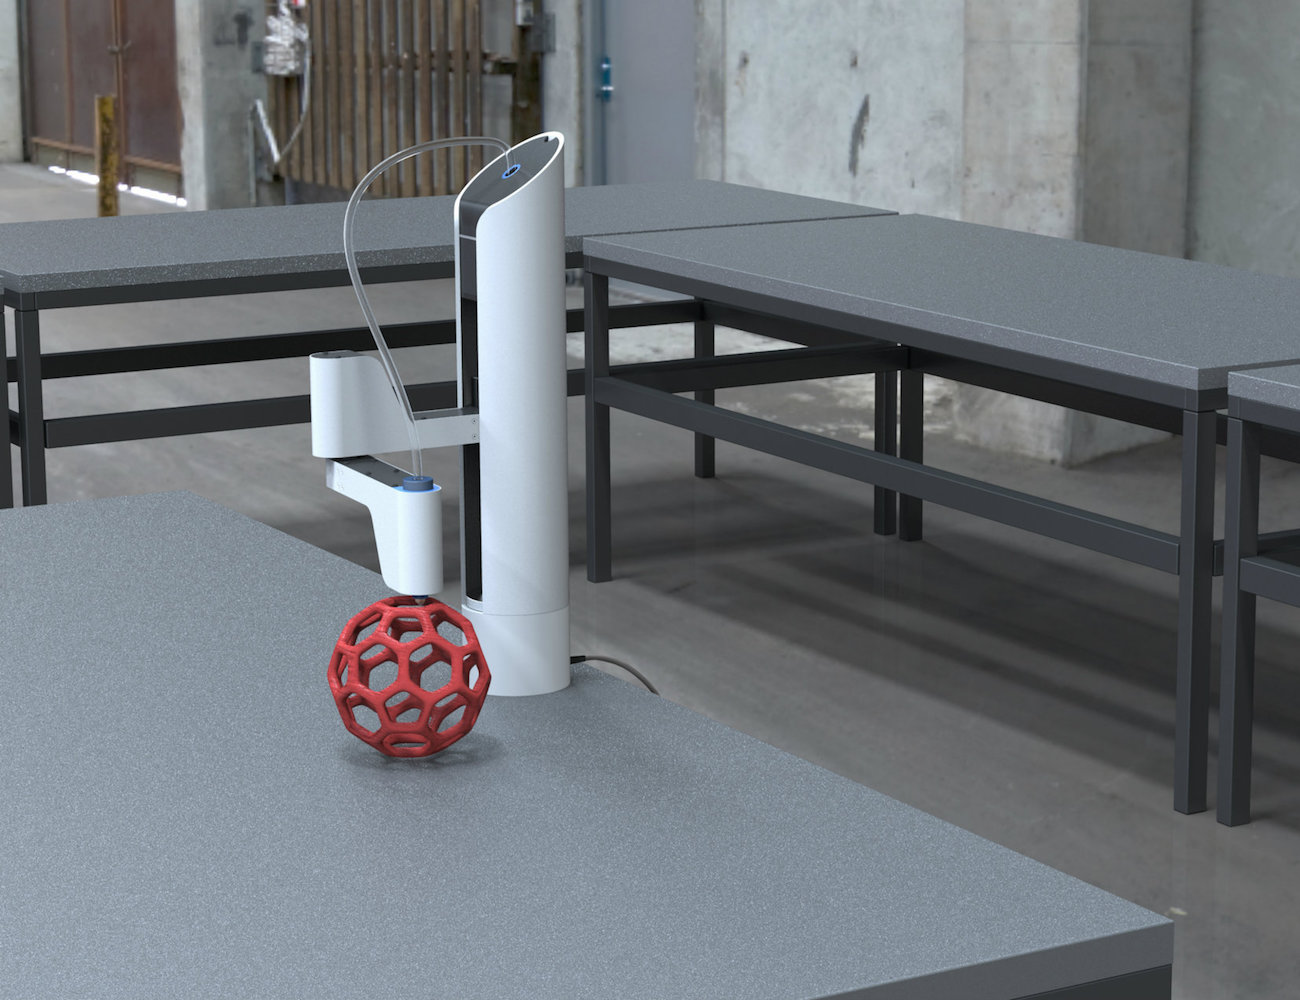 Makerarm – The First Robotic Arm